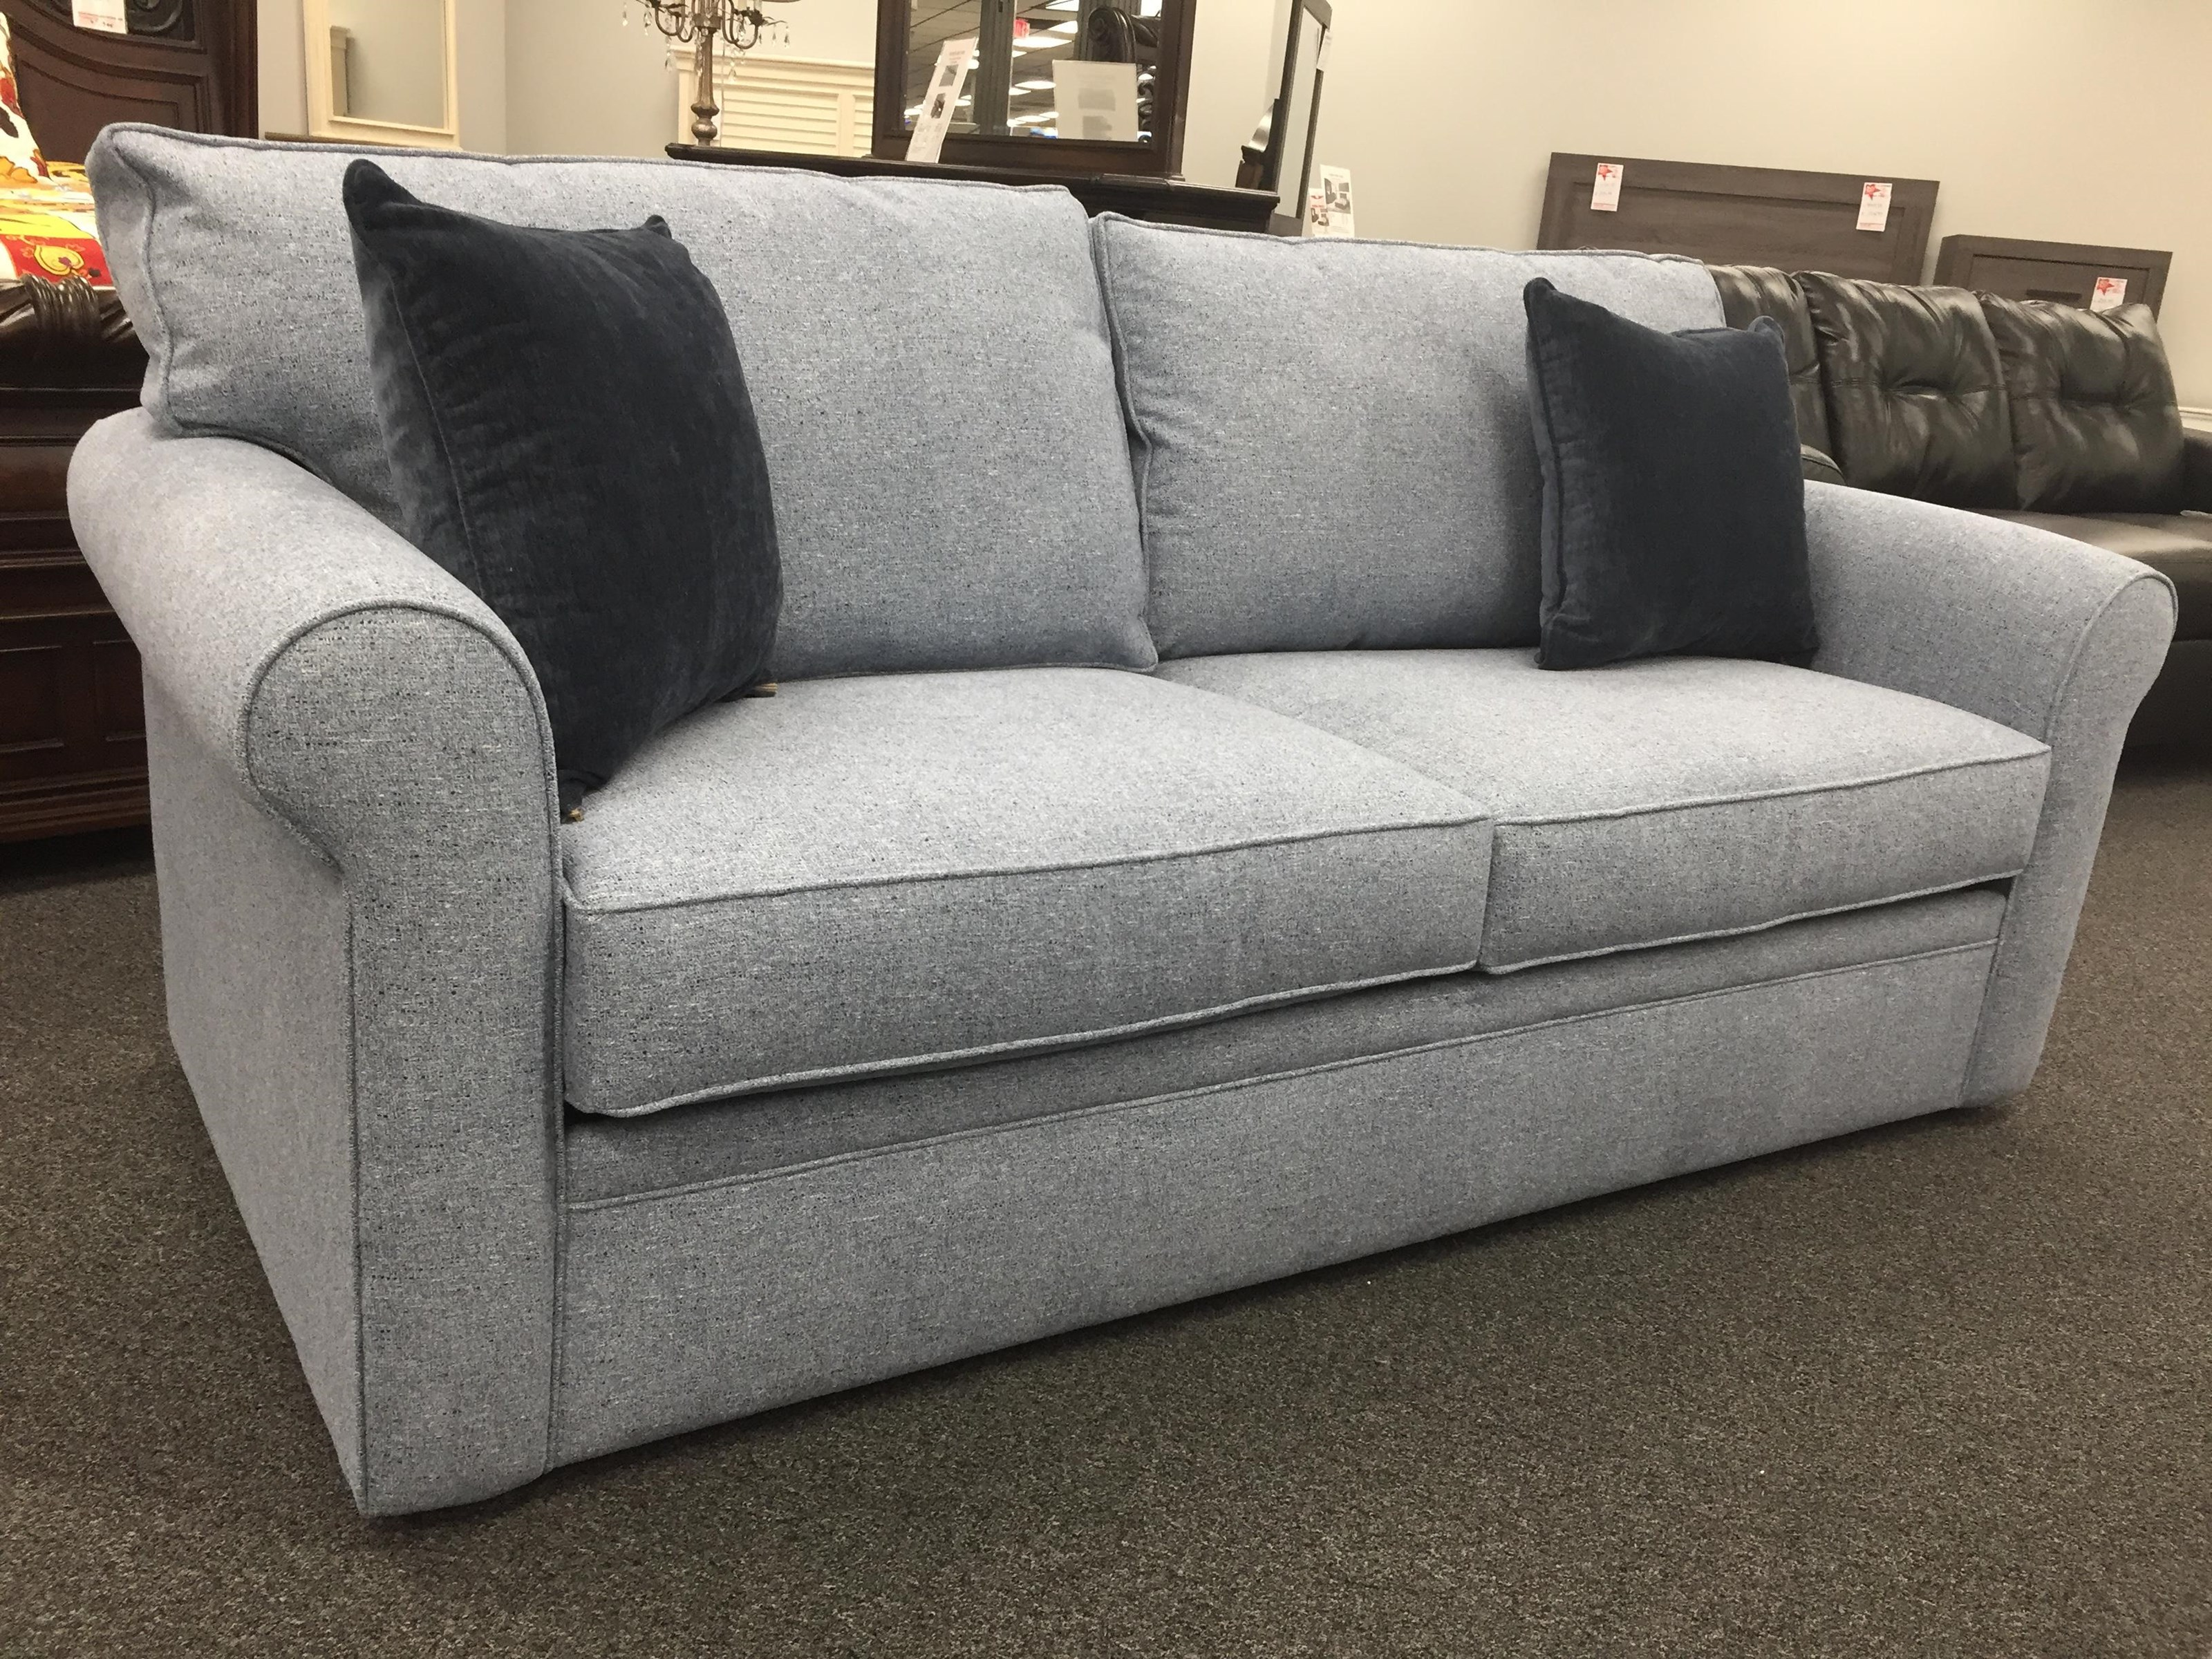 2950 Queen Sleeper Sofa by Overnight Sofa at Furniture Fair - North Carolina